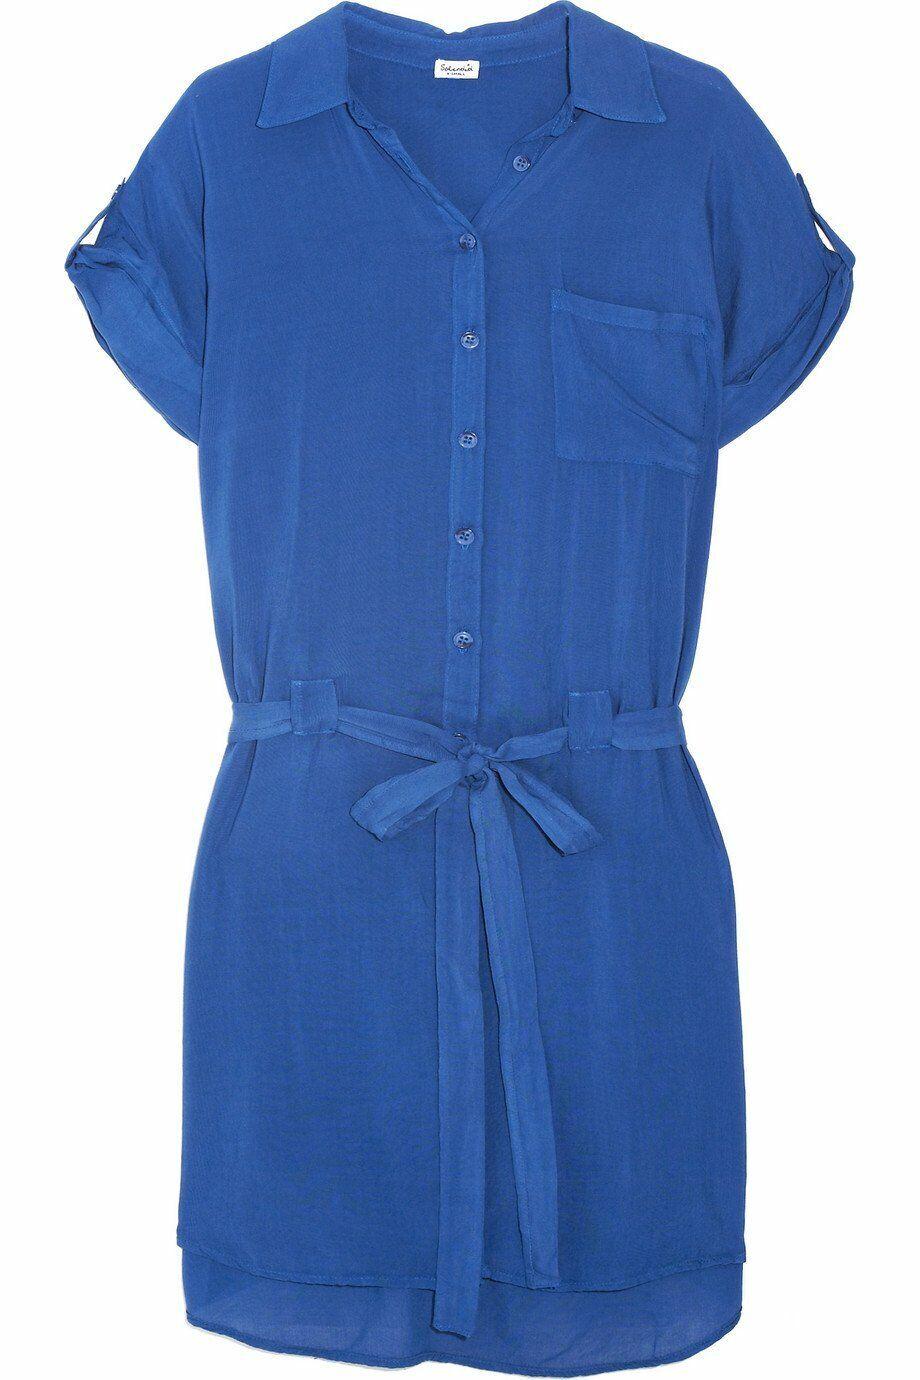 SPLENDID Electric Blau Viole Shirt Dress XS NEW